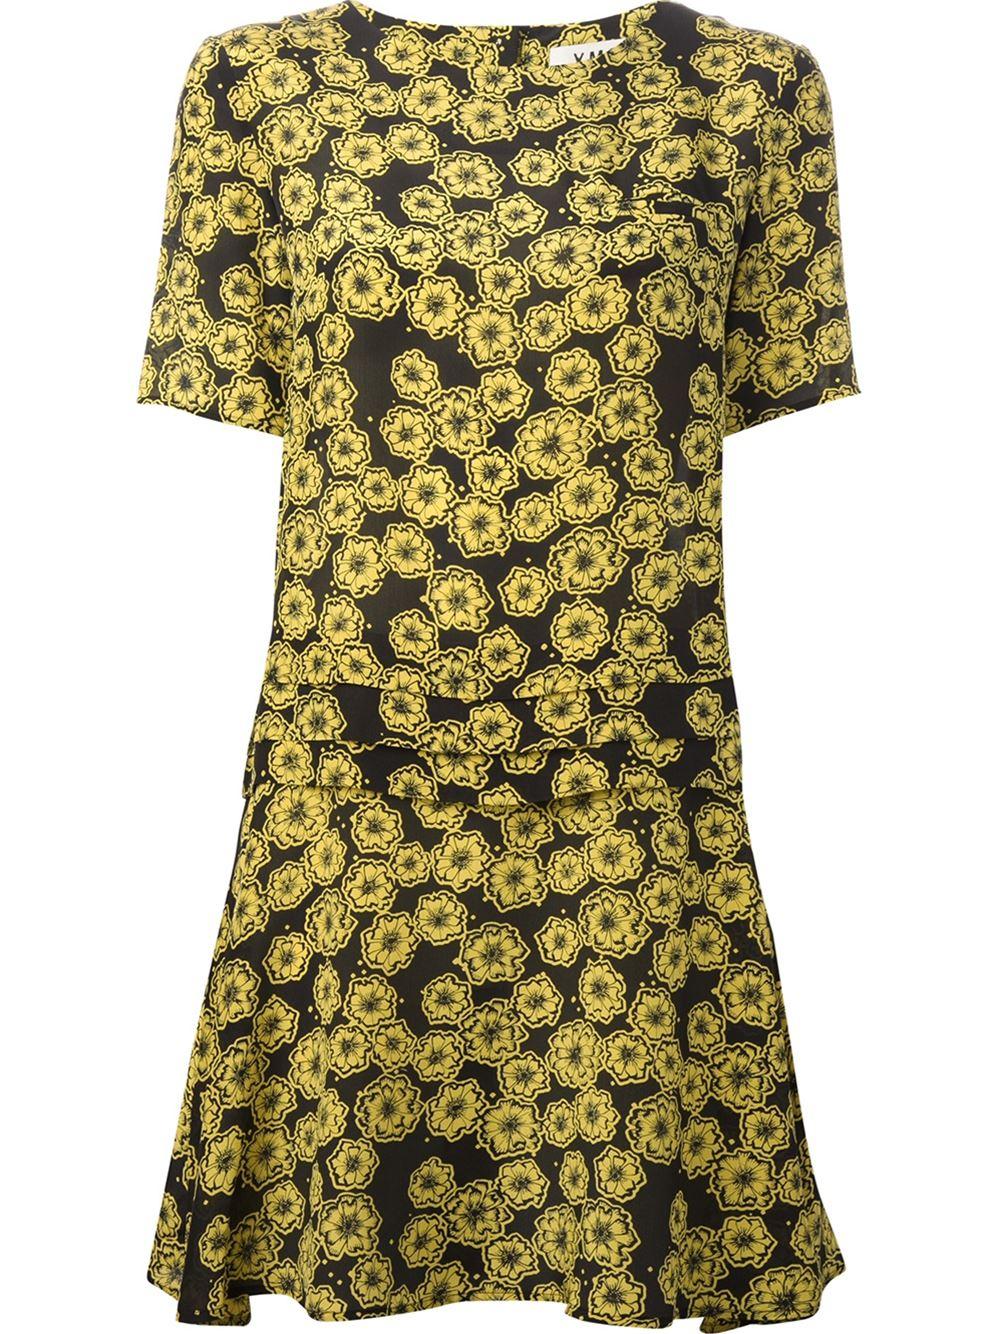 floral printed dresses - photo #7